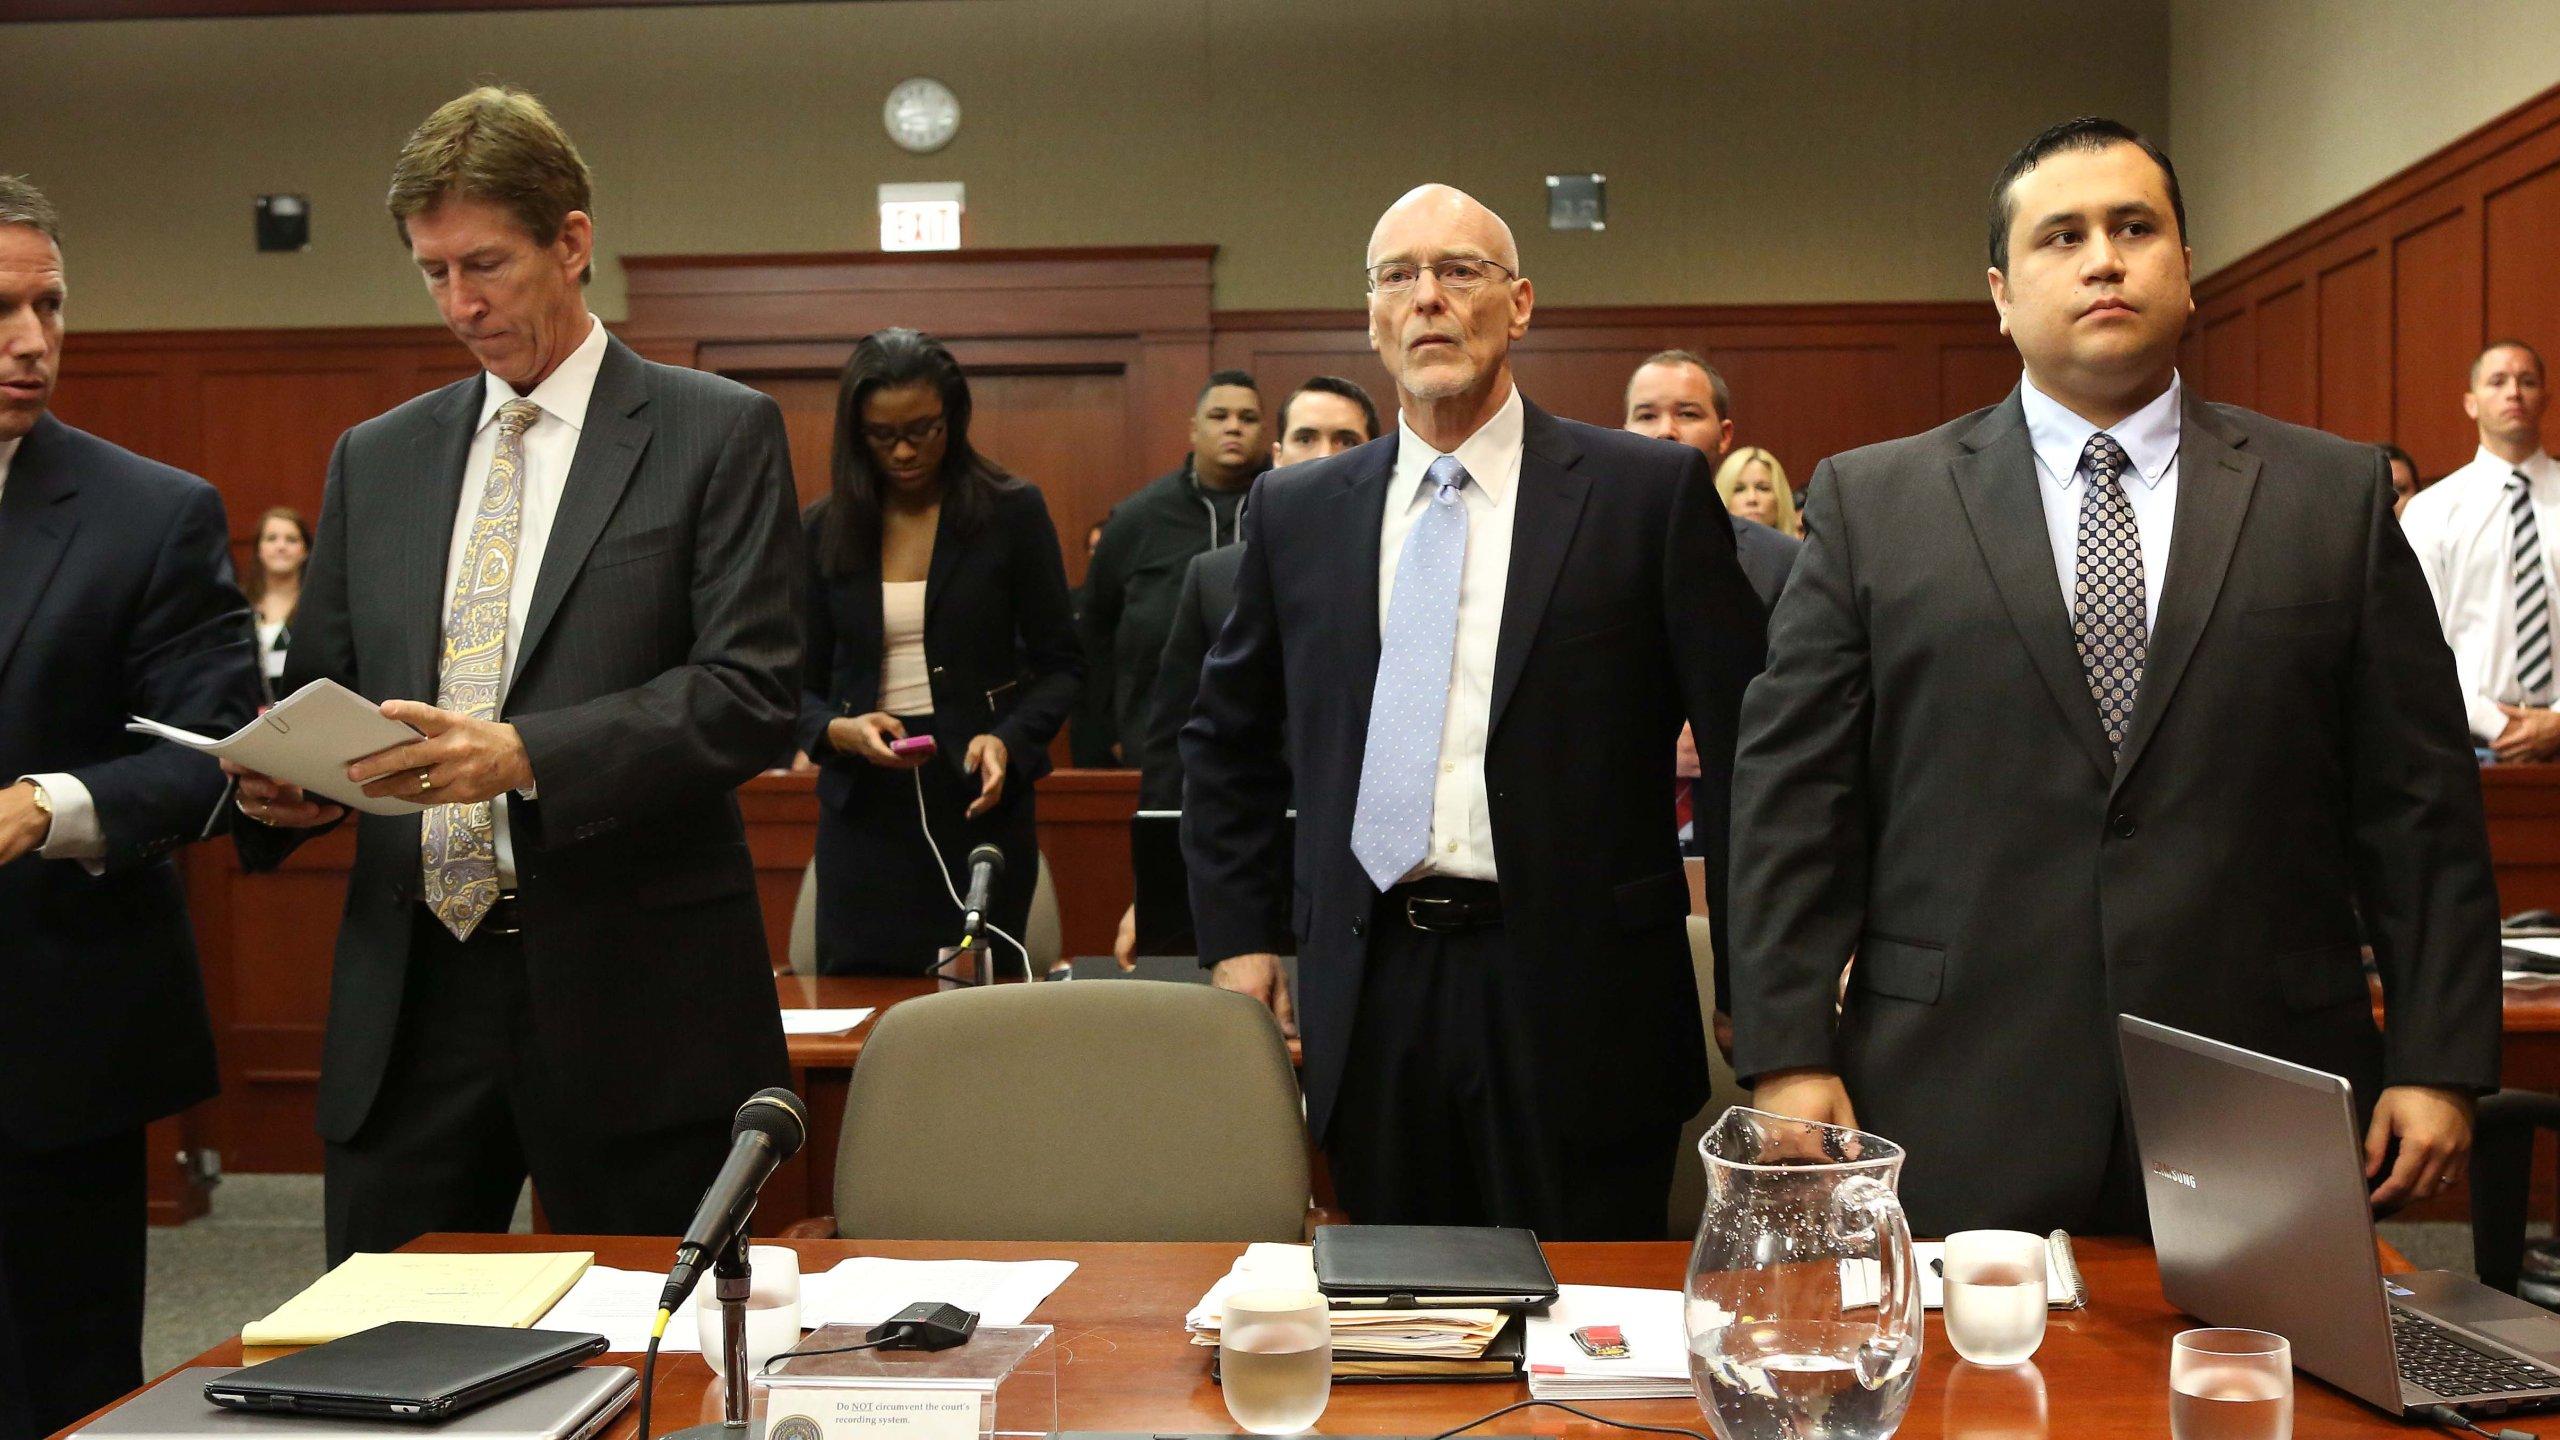 George Zimmerman watches the judge arrive in Seminole circuit court in Sanford, Fla., Monday. (Credit: CNN)